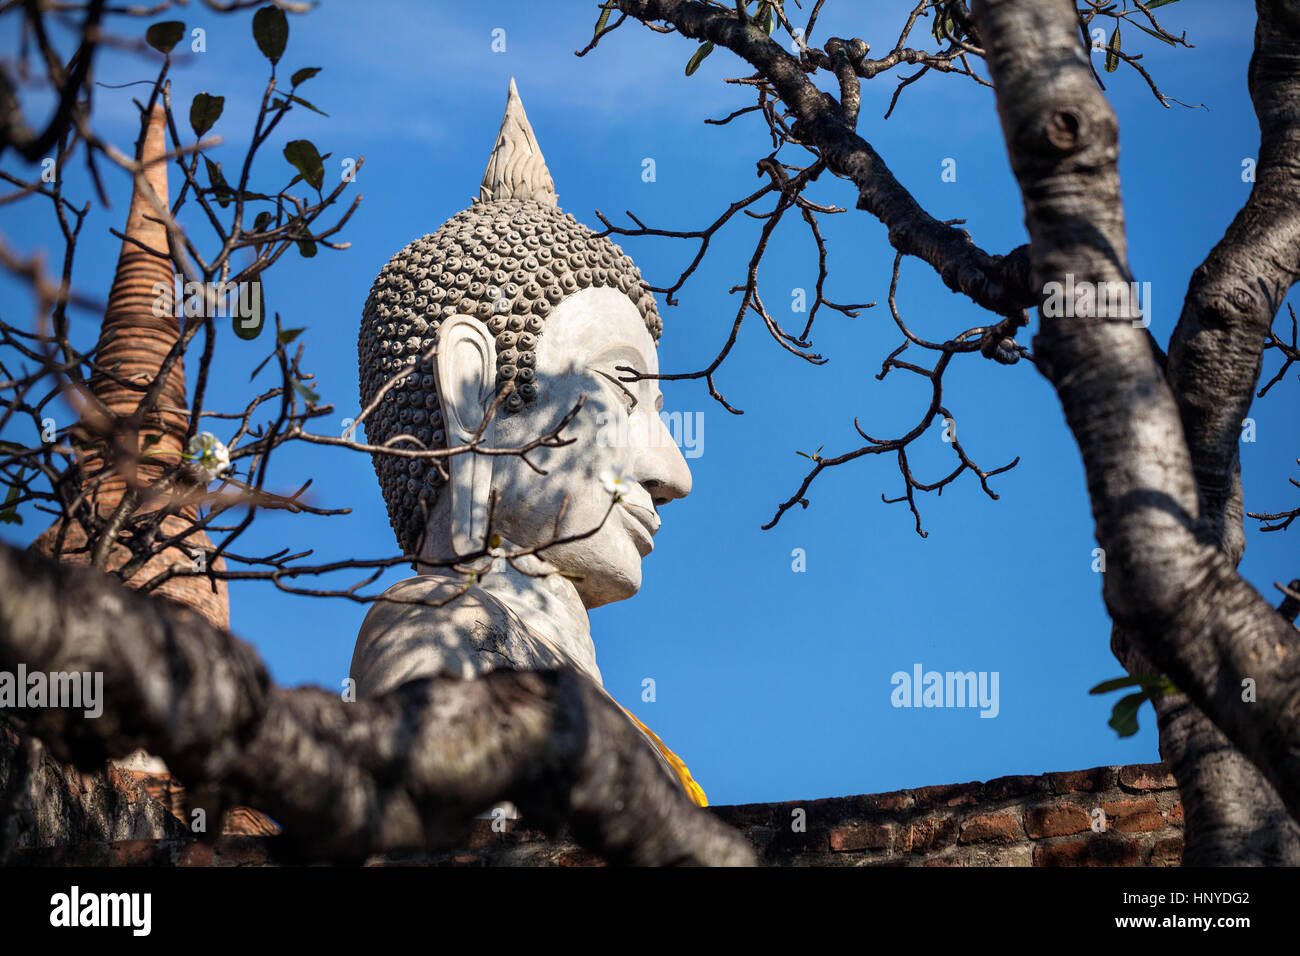 Big Buddha statue in Wat Yai Chai Mongkol monastery in Ayuttaya, Thailand - Stock Image